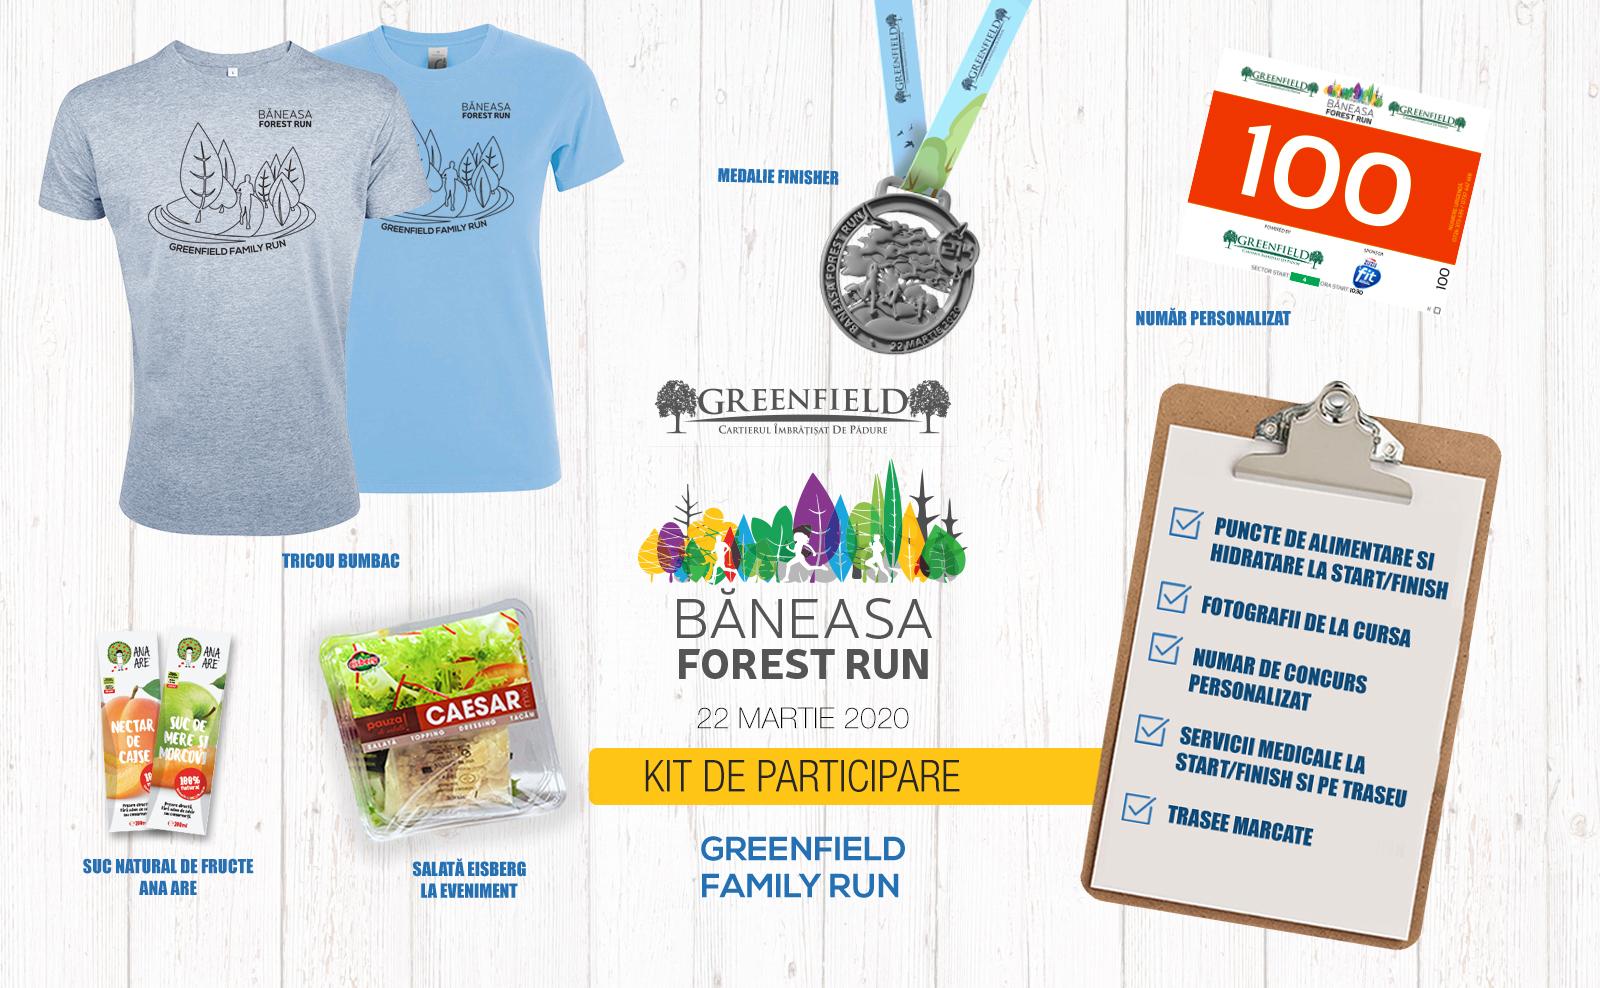 Baneasa Forest Run - kit participare family run